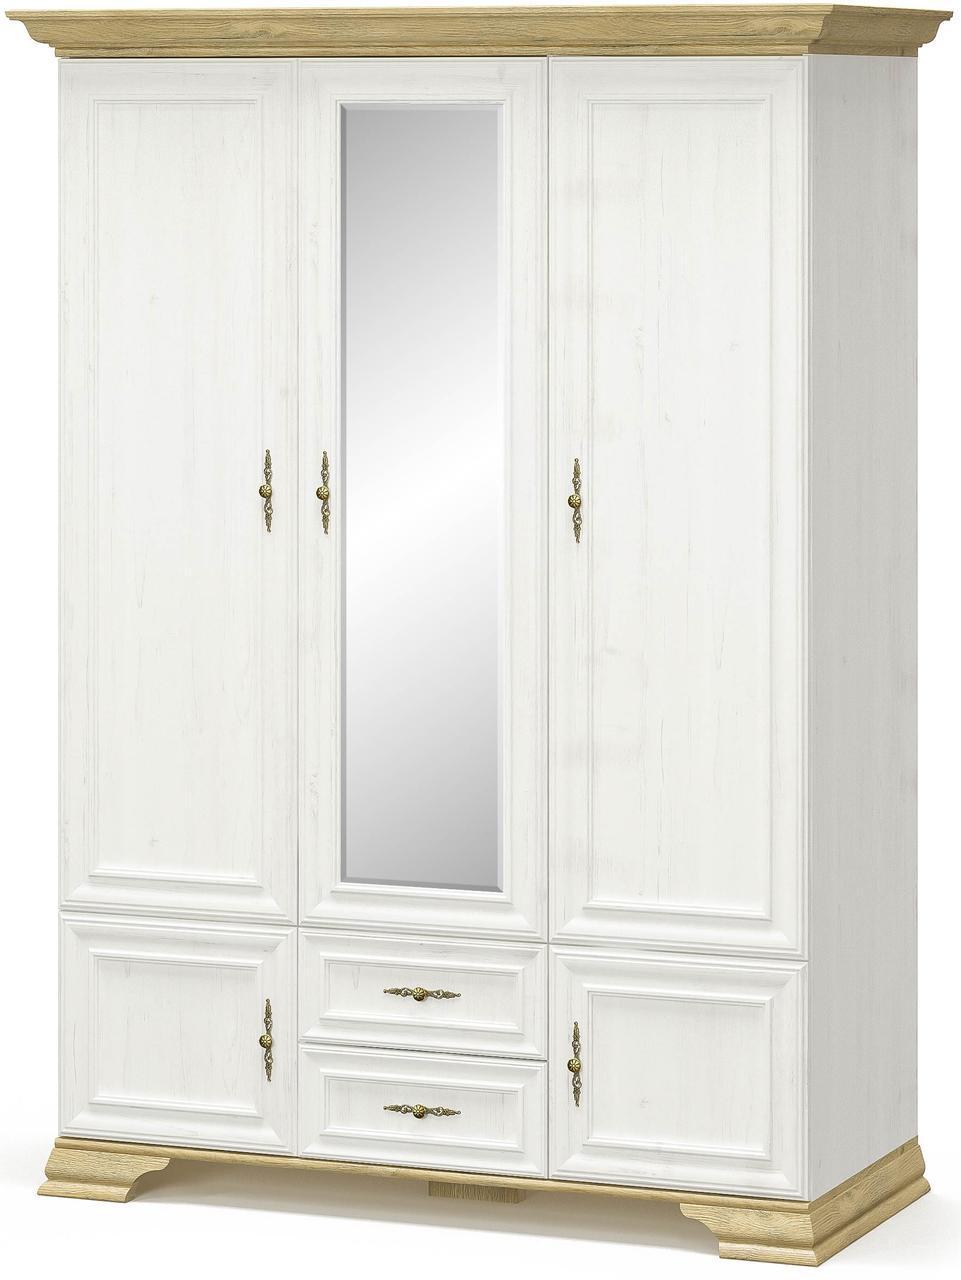 Шкаф 3Д Ирис Андерсон пайн + Дуб золотой Мебель Сервис (145.1х62.2х197.6 см)